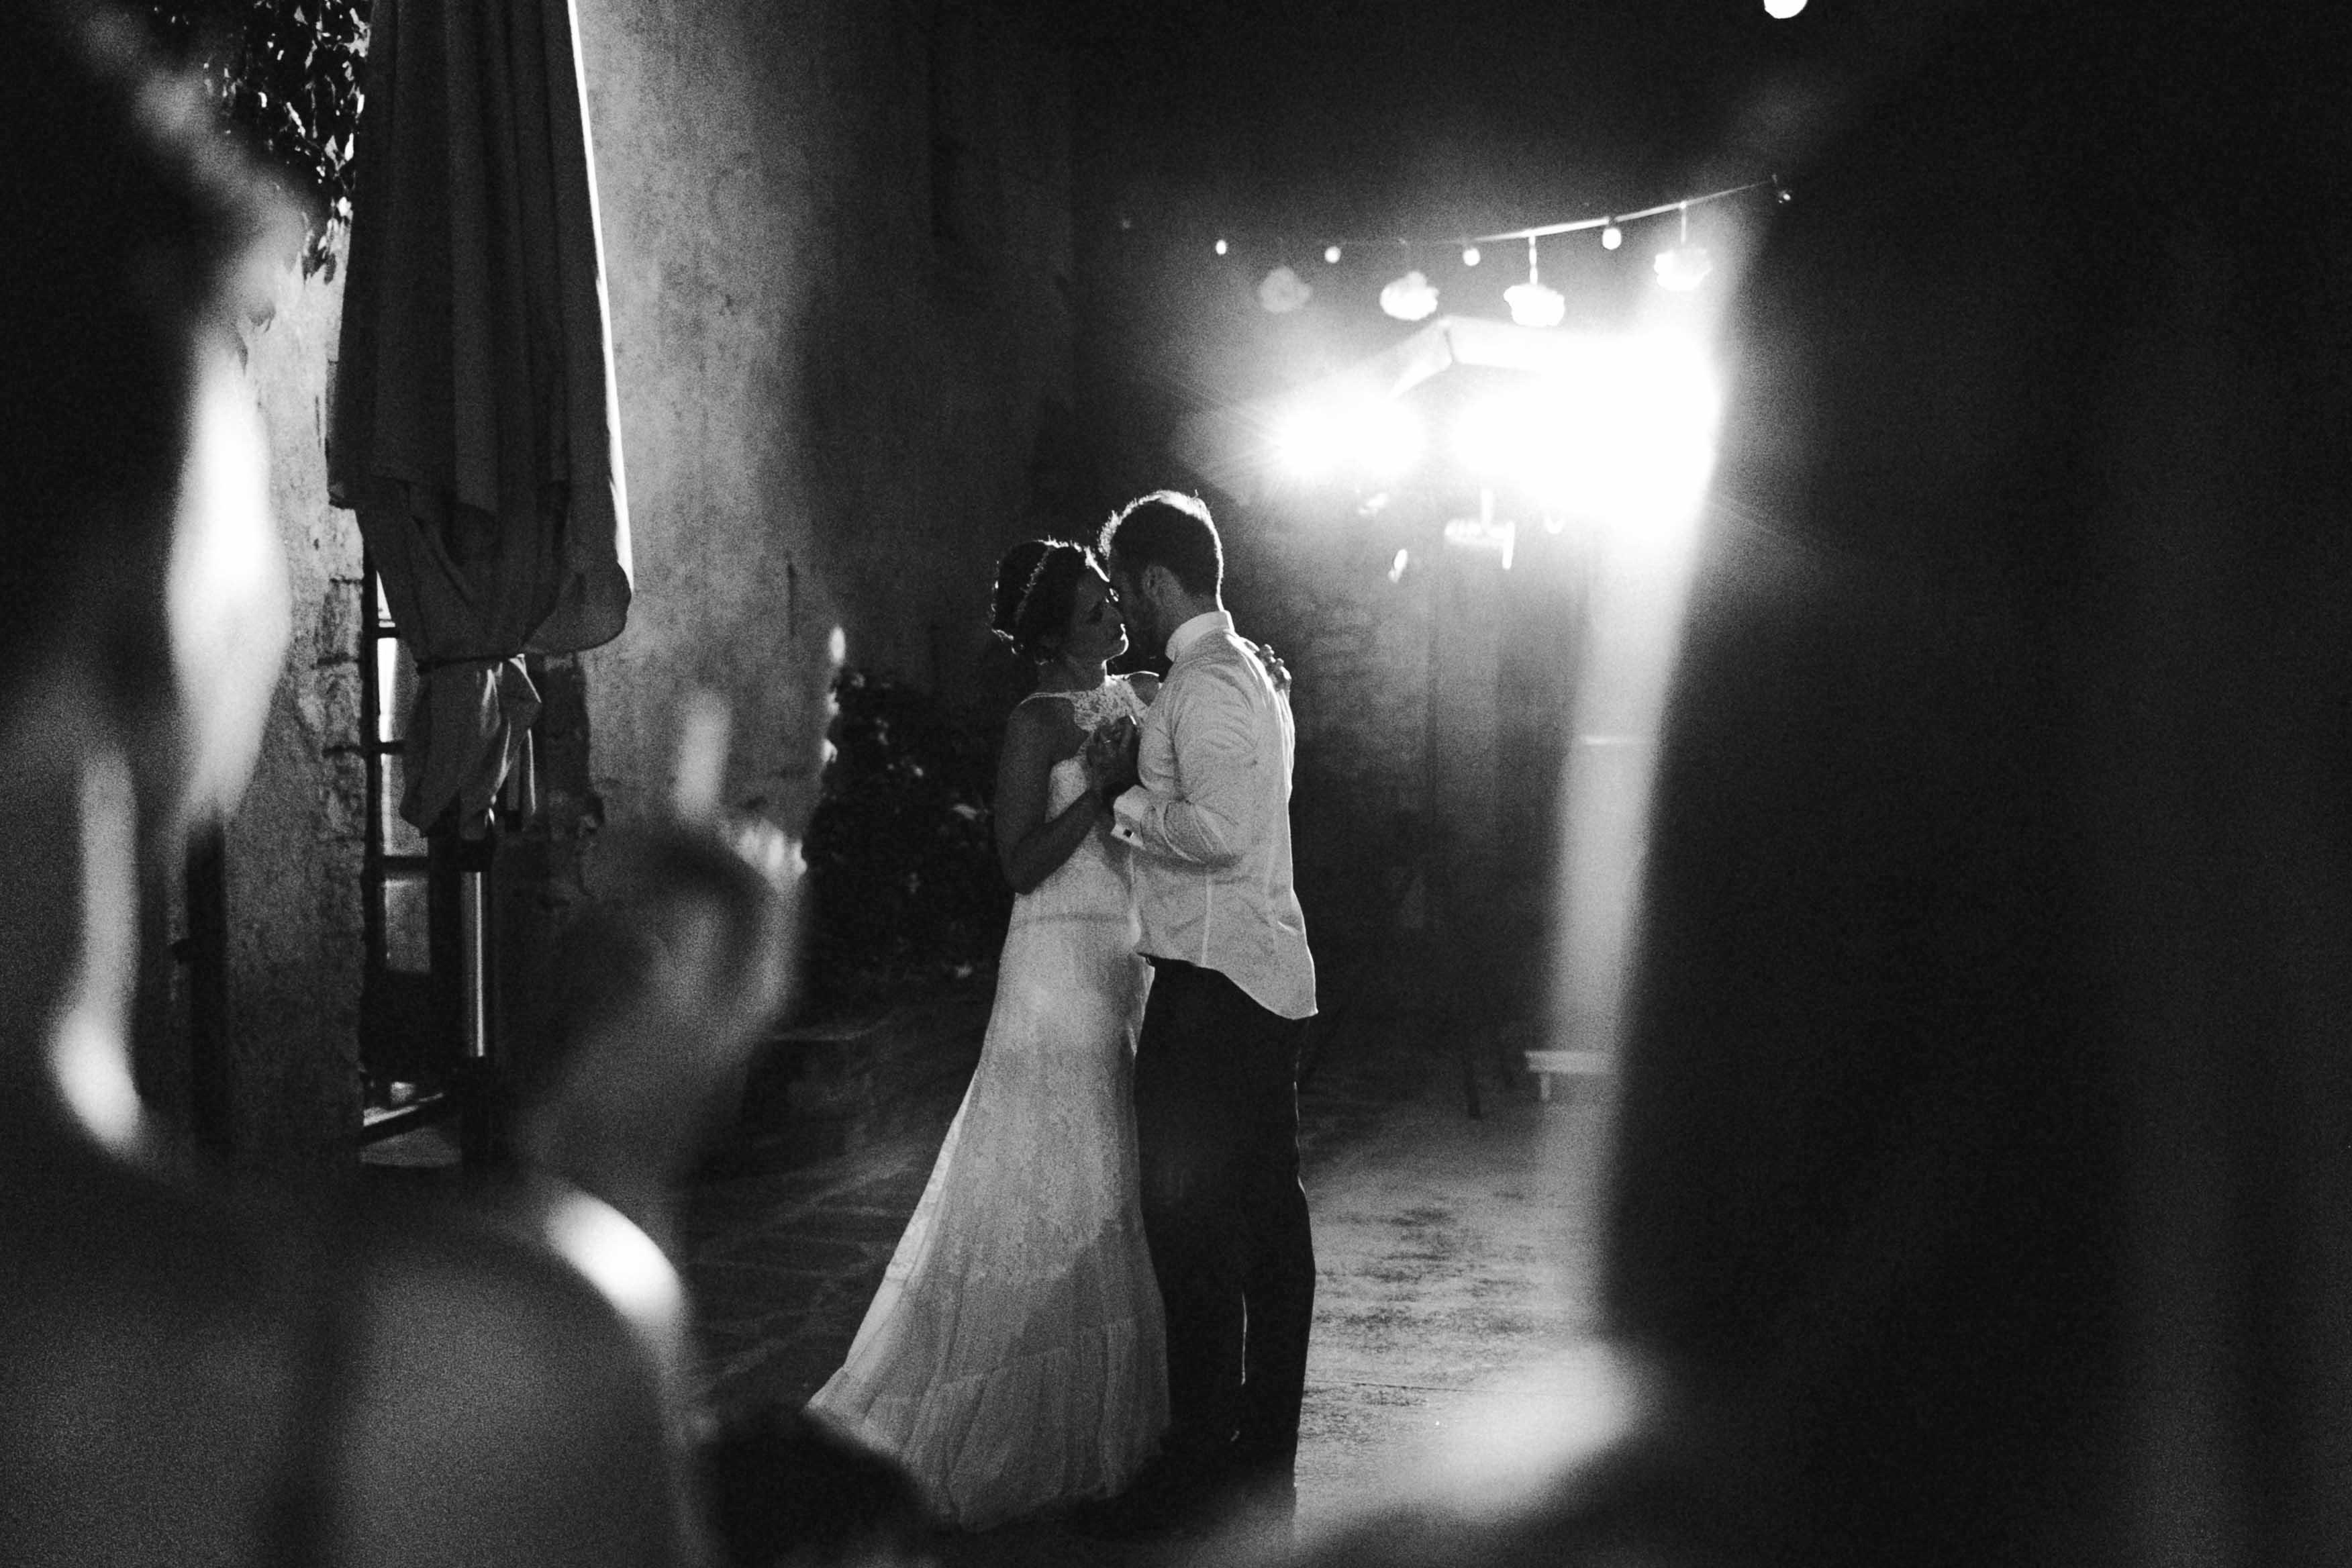 Boda rústica en la montaña. fotgrafo de bodas barcelona_112